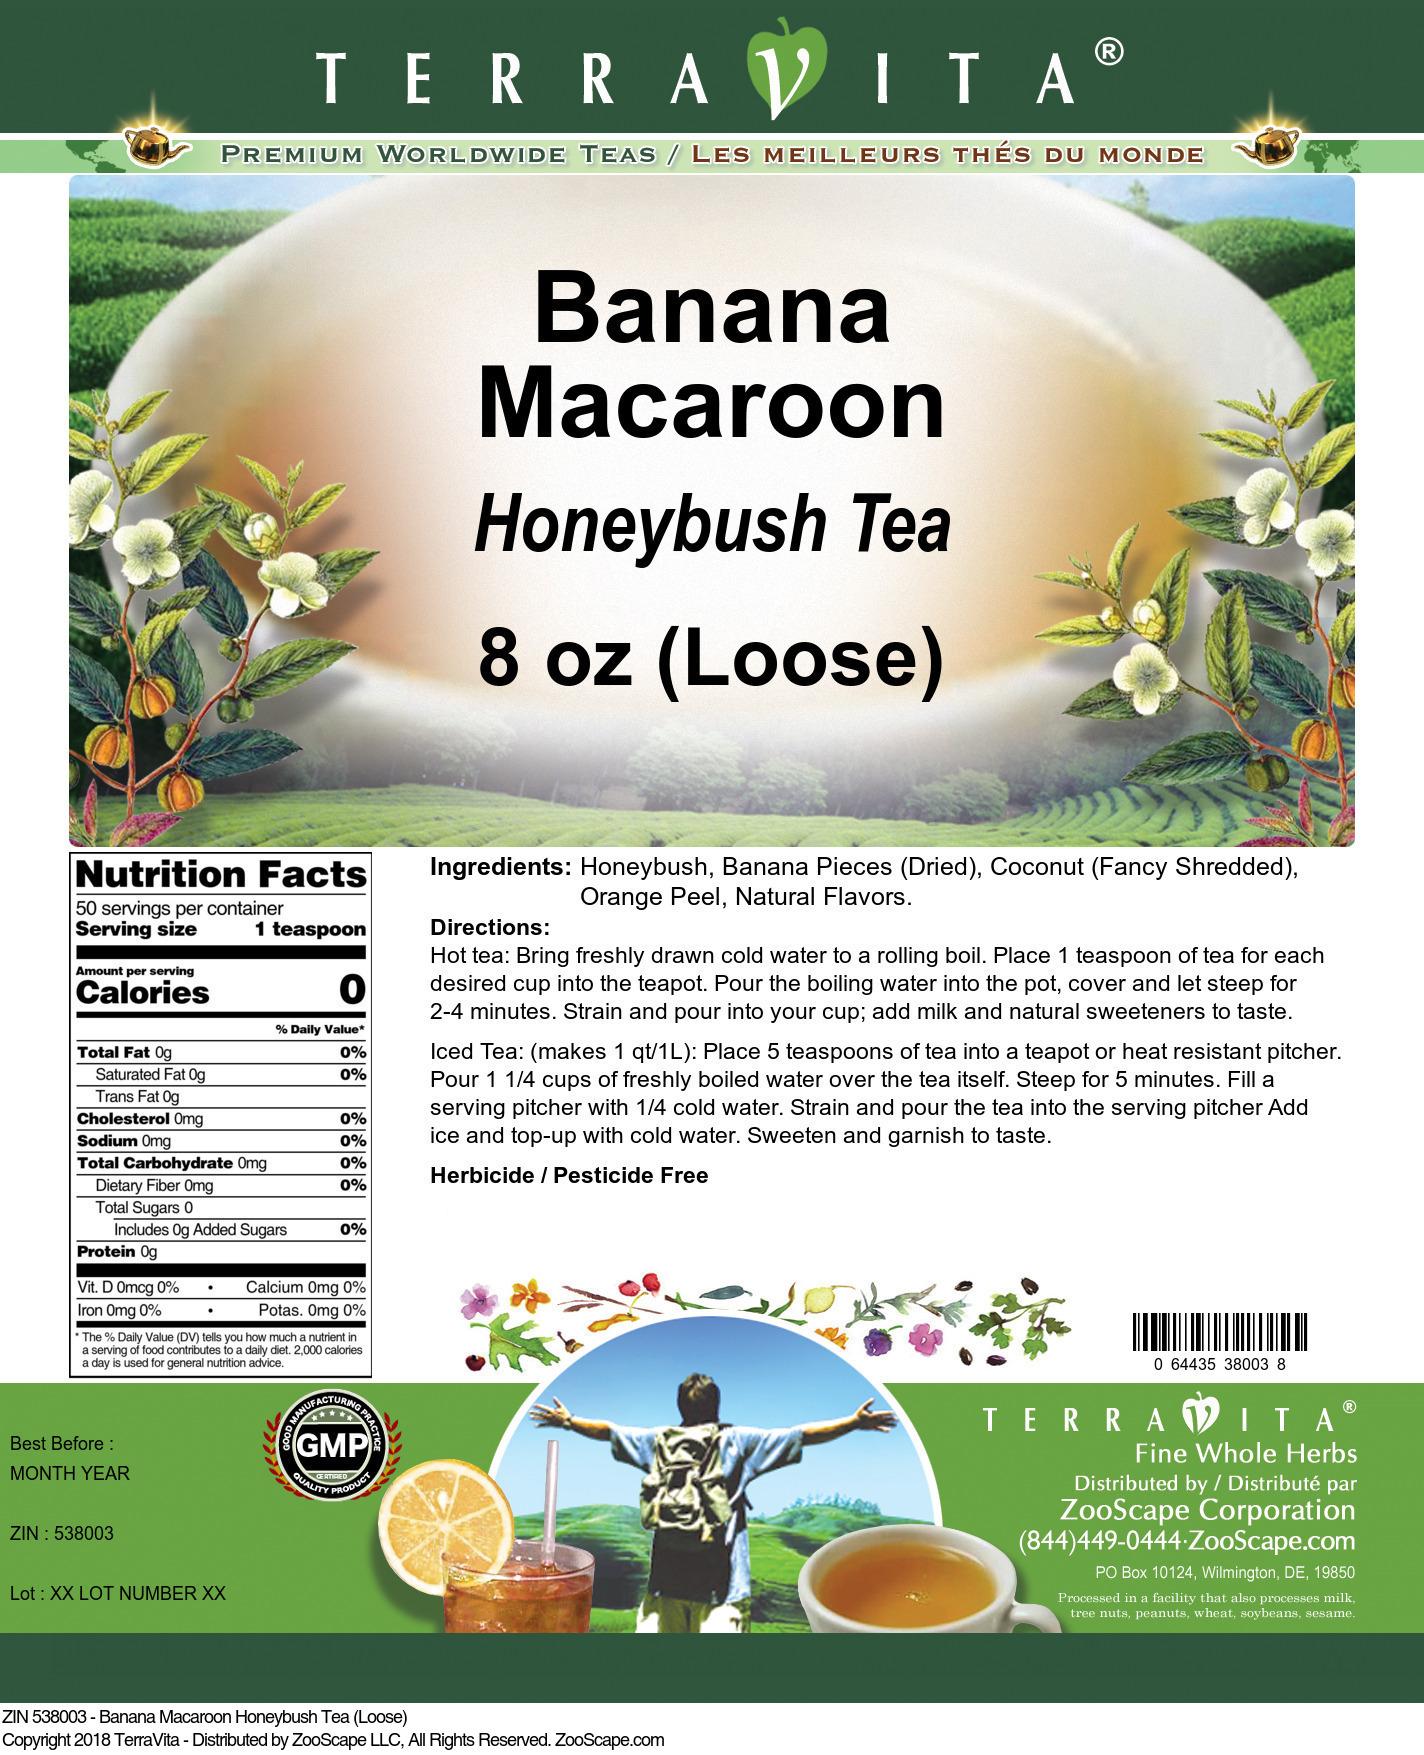 Banana Macaroon Honeybush Tea (Loose)